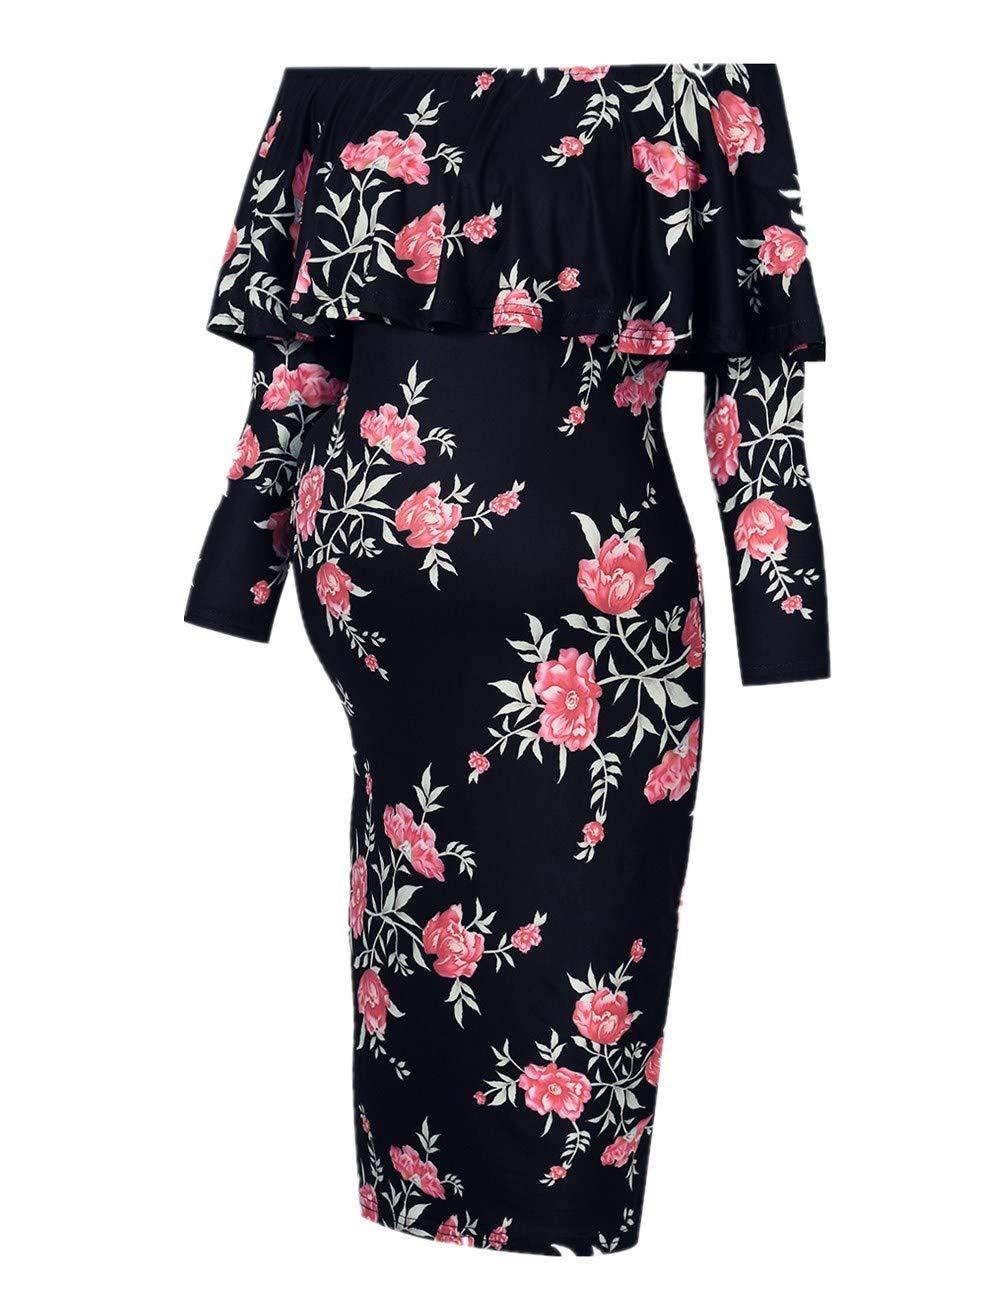 MissQee Women's Maternity Dress 3/4 Sleeve Off Shoulder Casual Maxi Dress (L,Black Flower-Long)